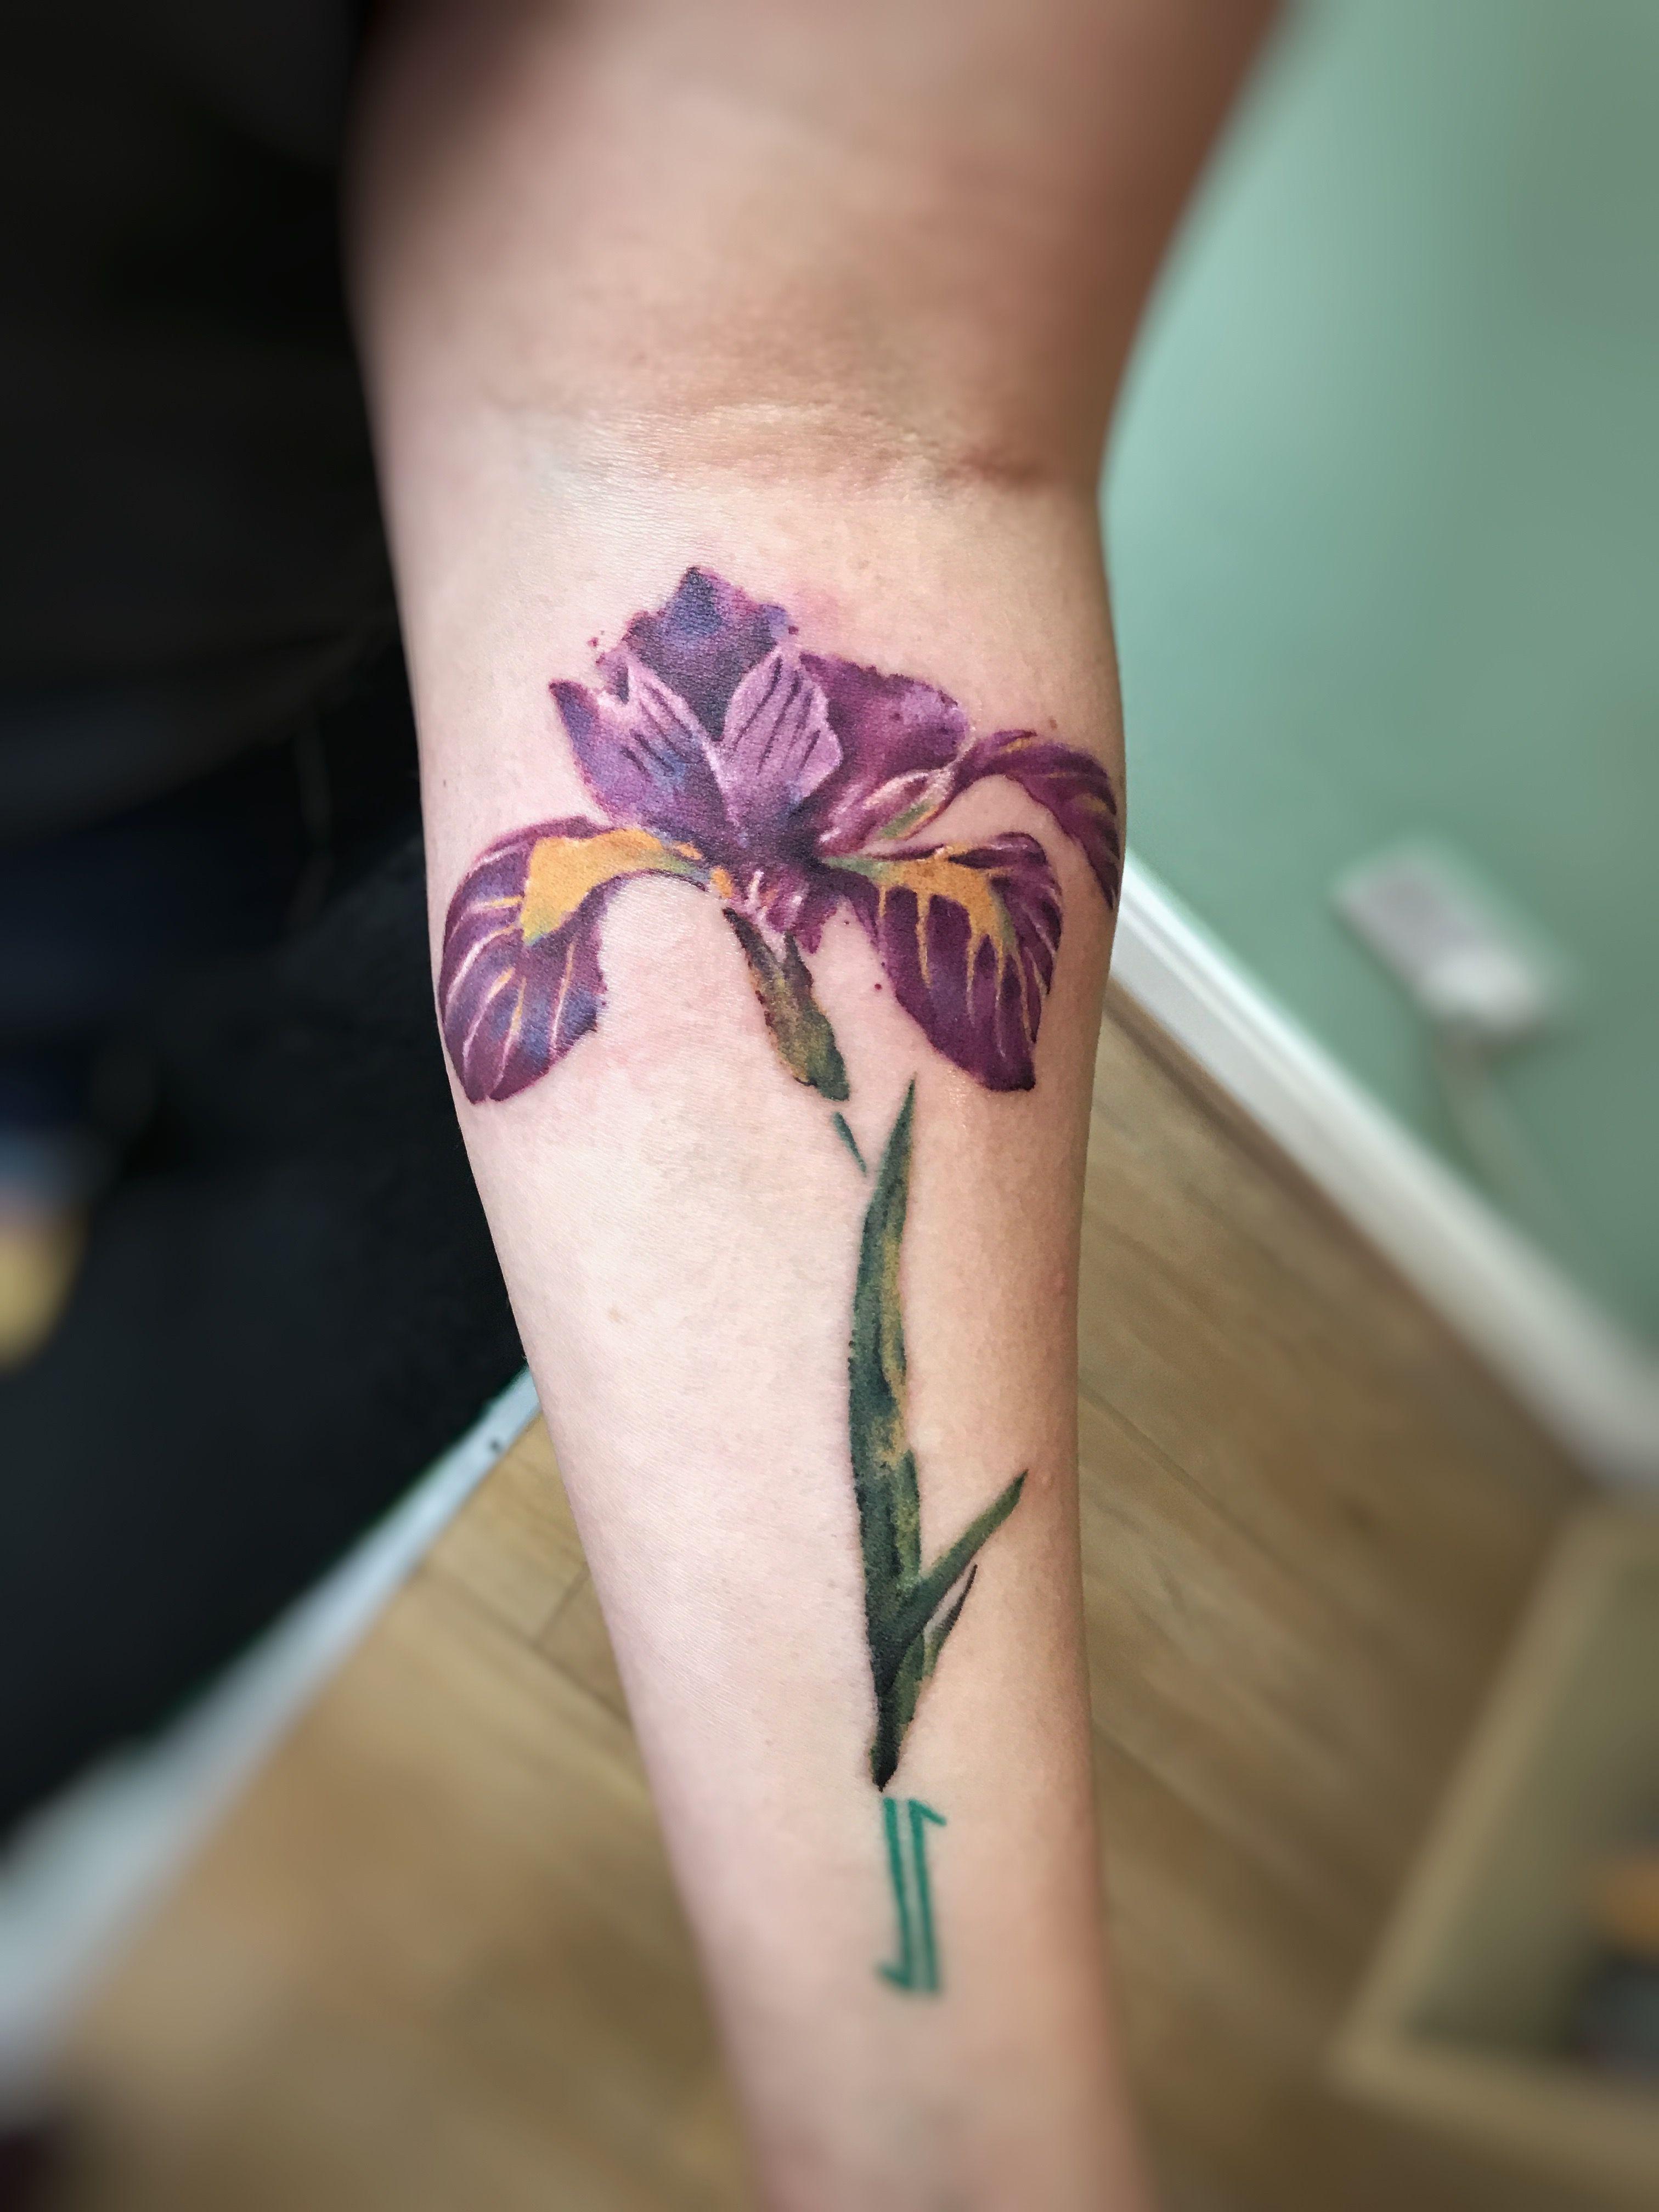 Watercolor iris flower tattoo done by yuki zerkjad yuki zerkjad watercolor iris flower tattoo done by yuki zerkjad izmirmasajfo Images